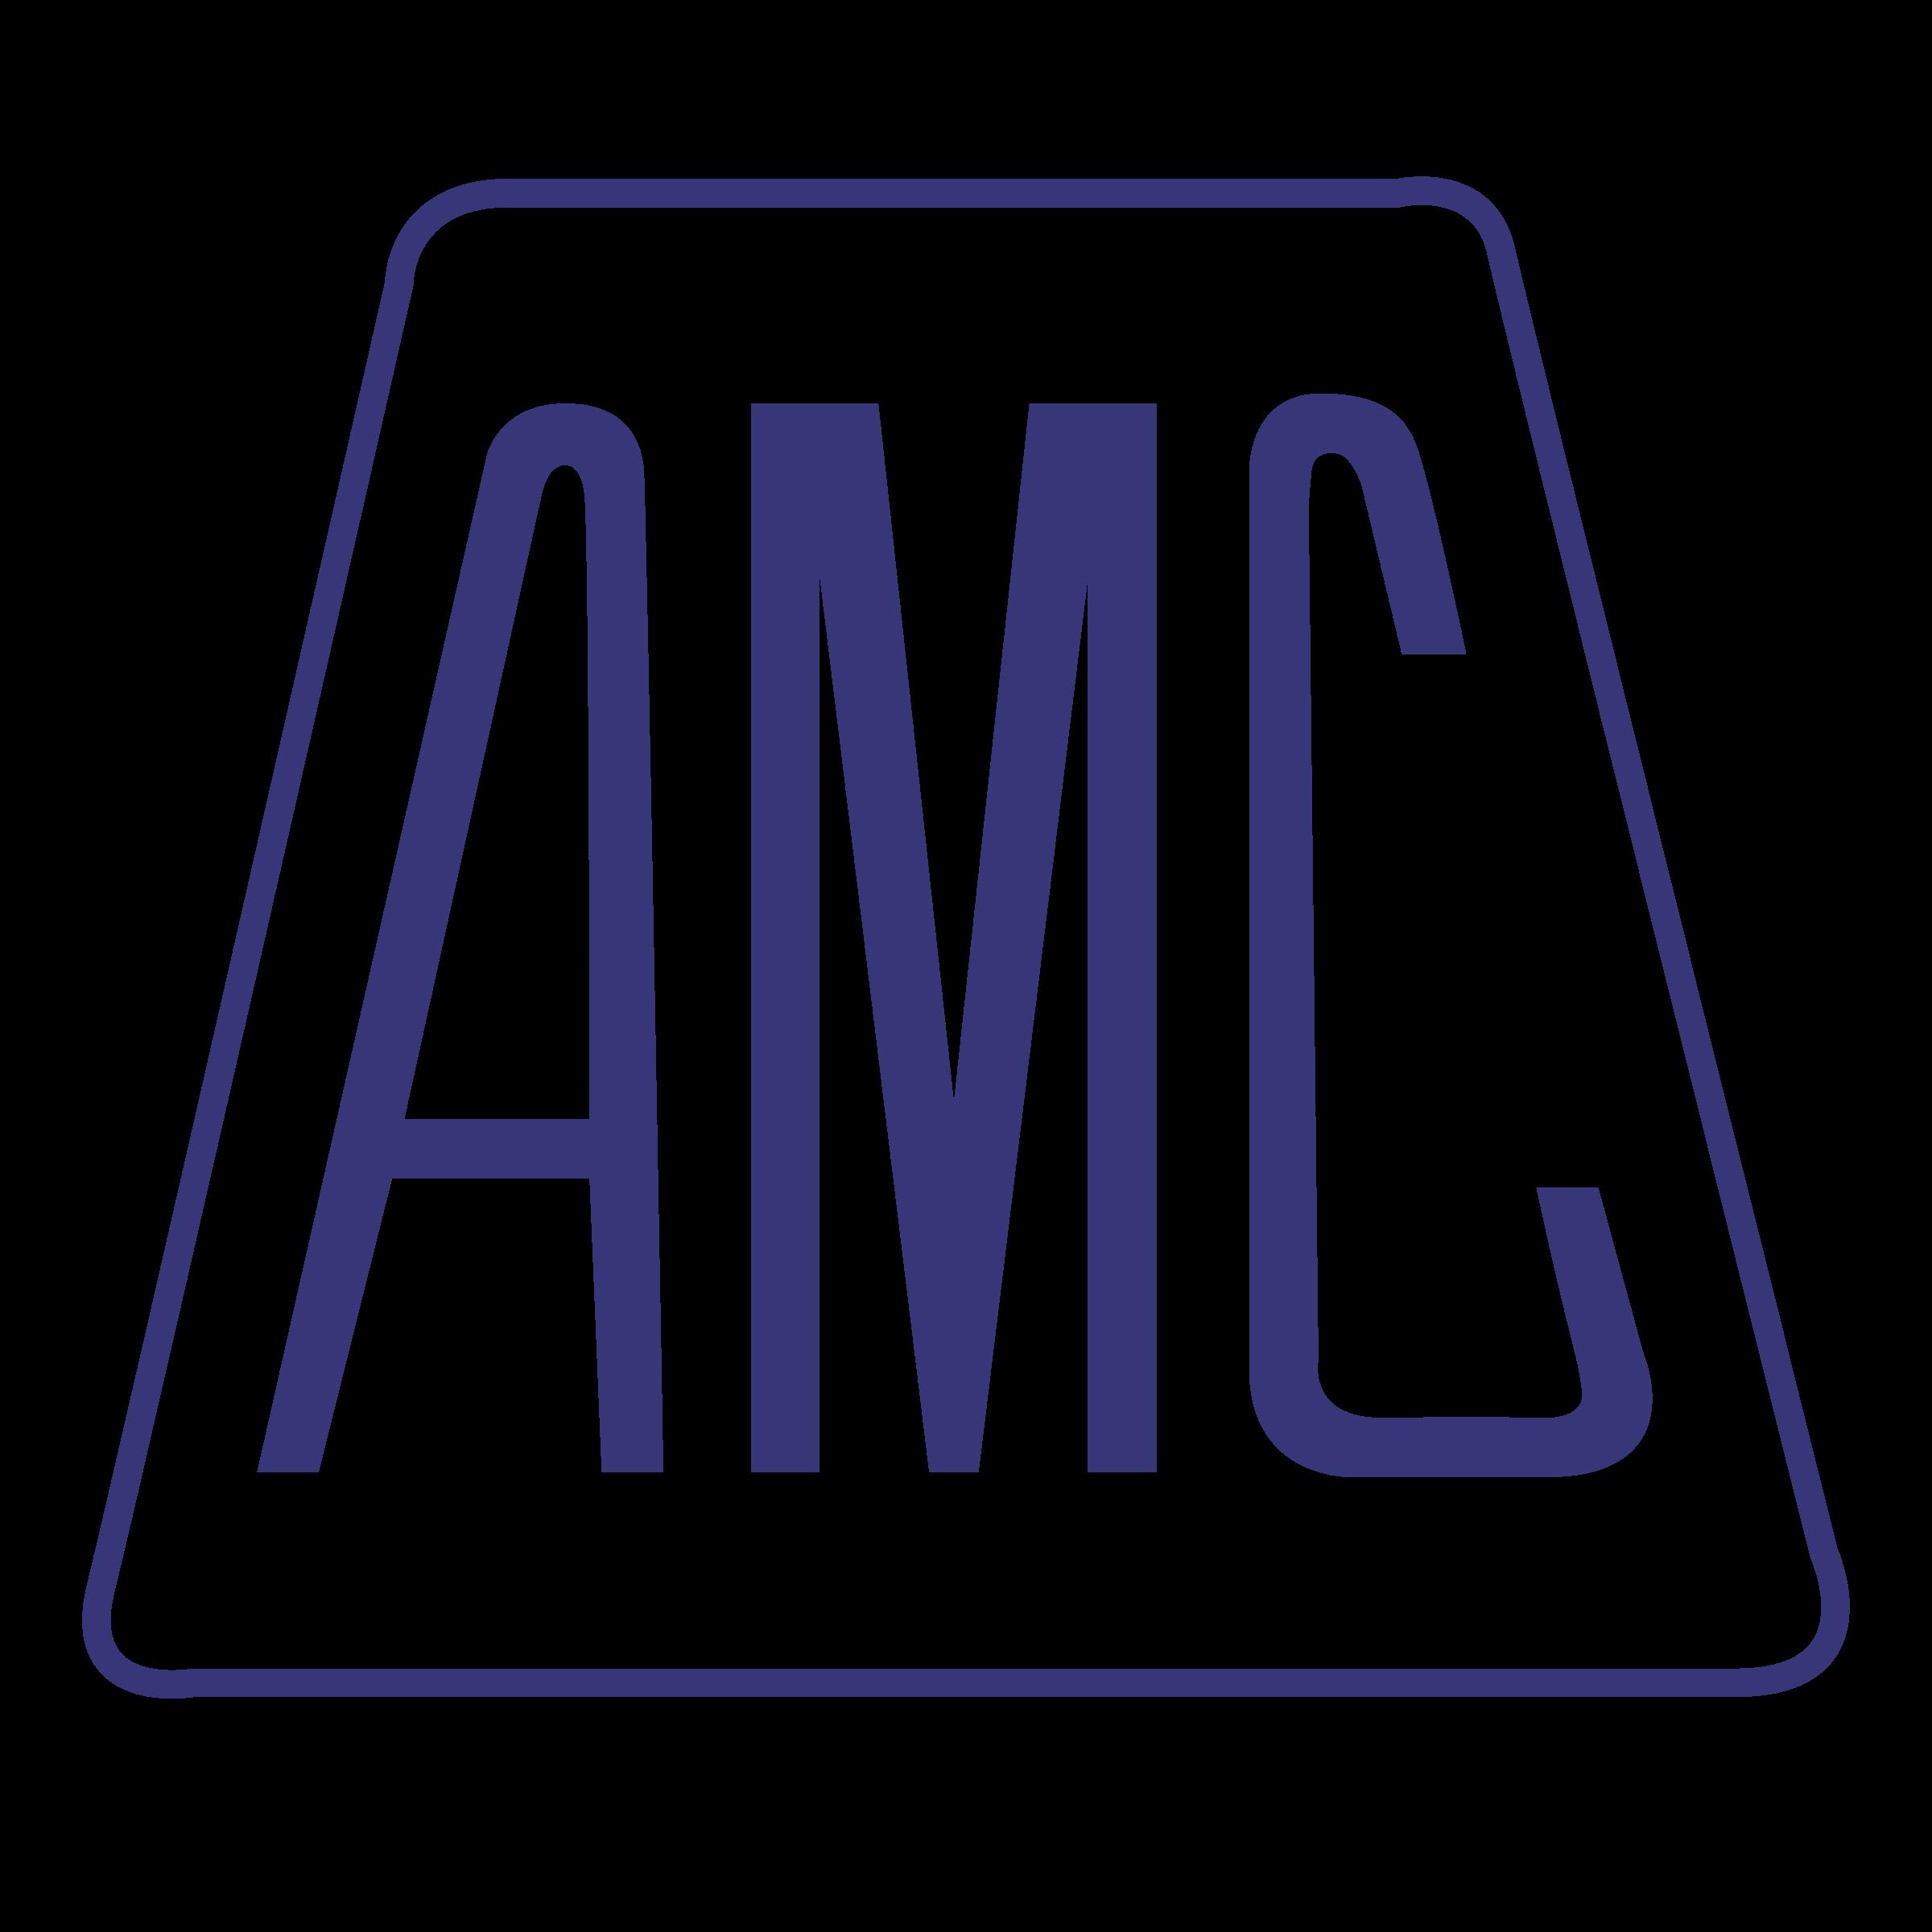 AMC 04 Logo PNG Transparent